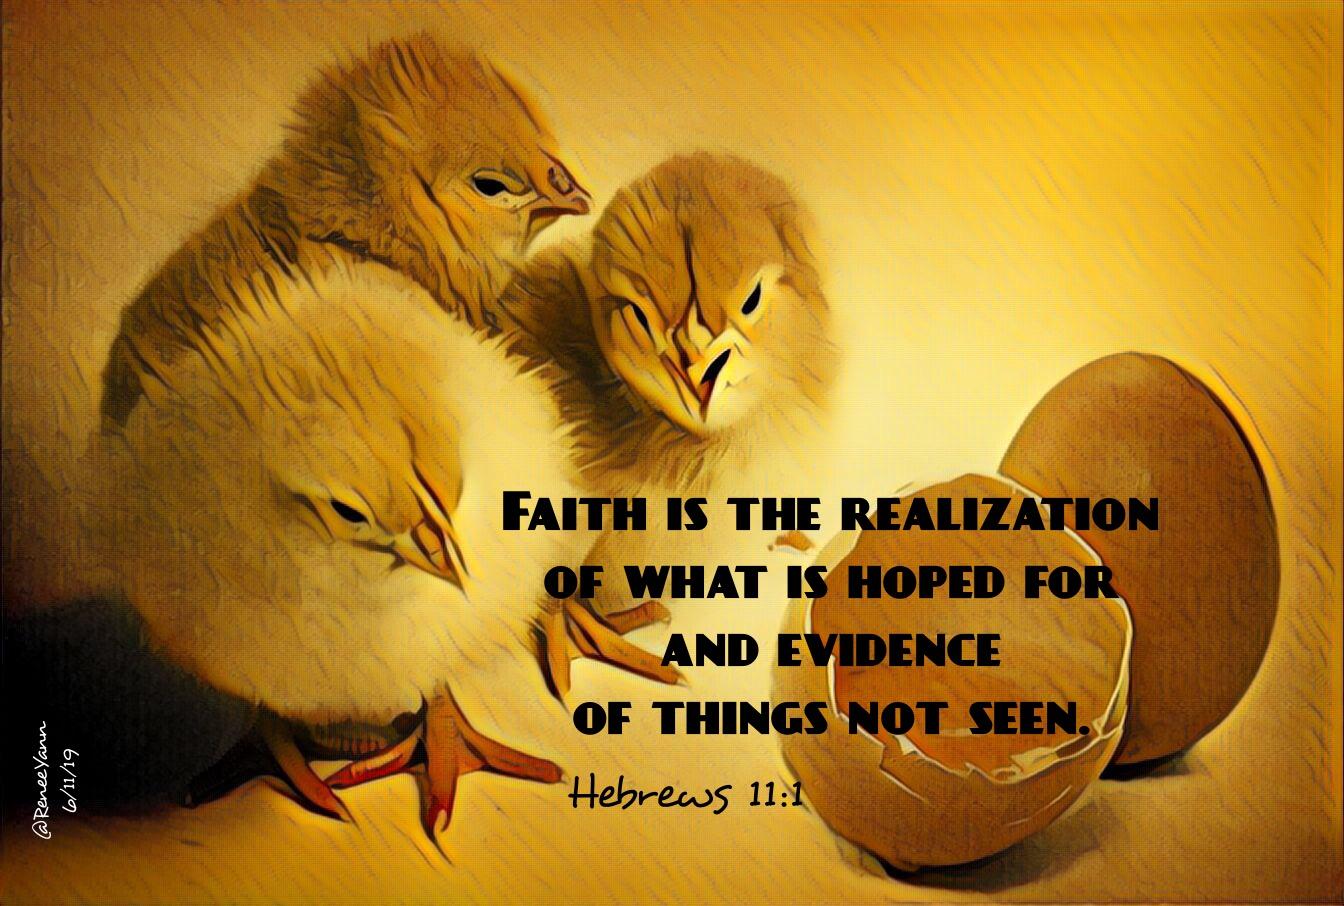 Hebrews11_1 Fith_hope